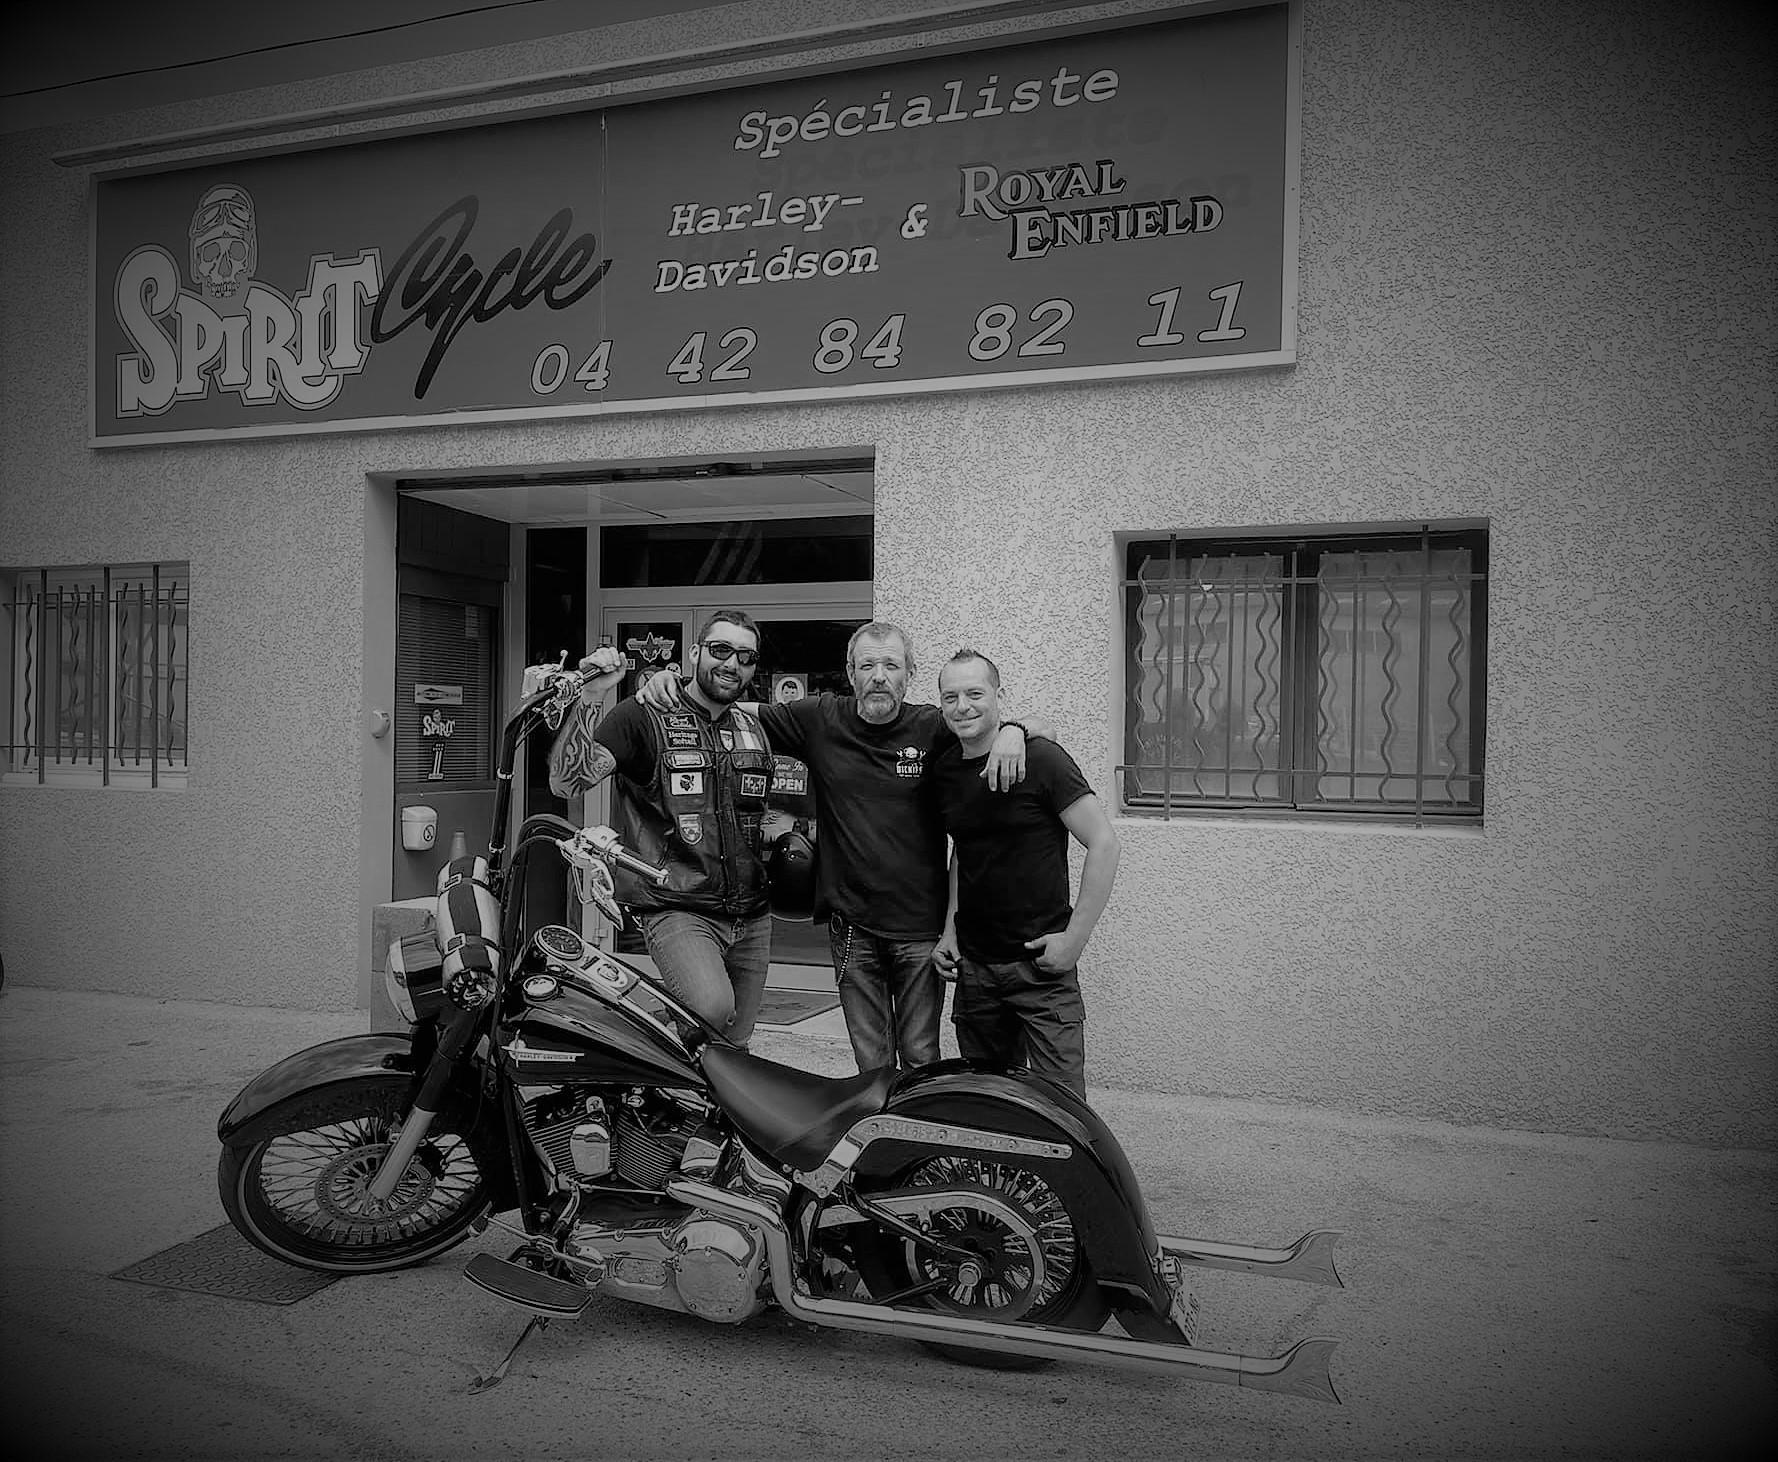 Spirit Cycle spécialiste Harley Davidson et Royal Enfield